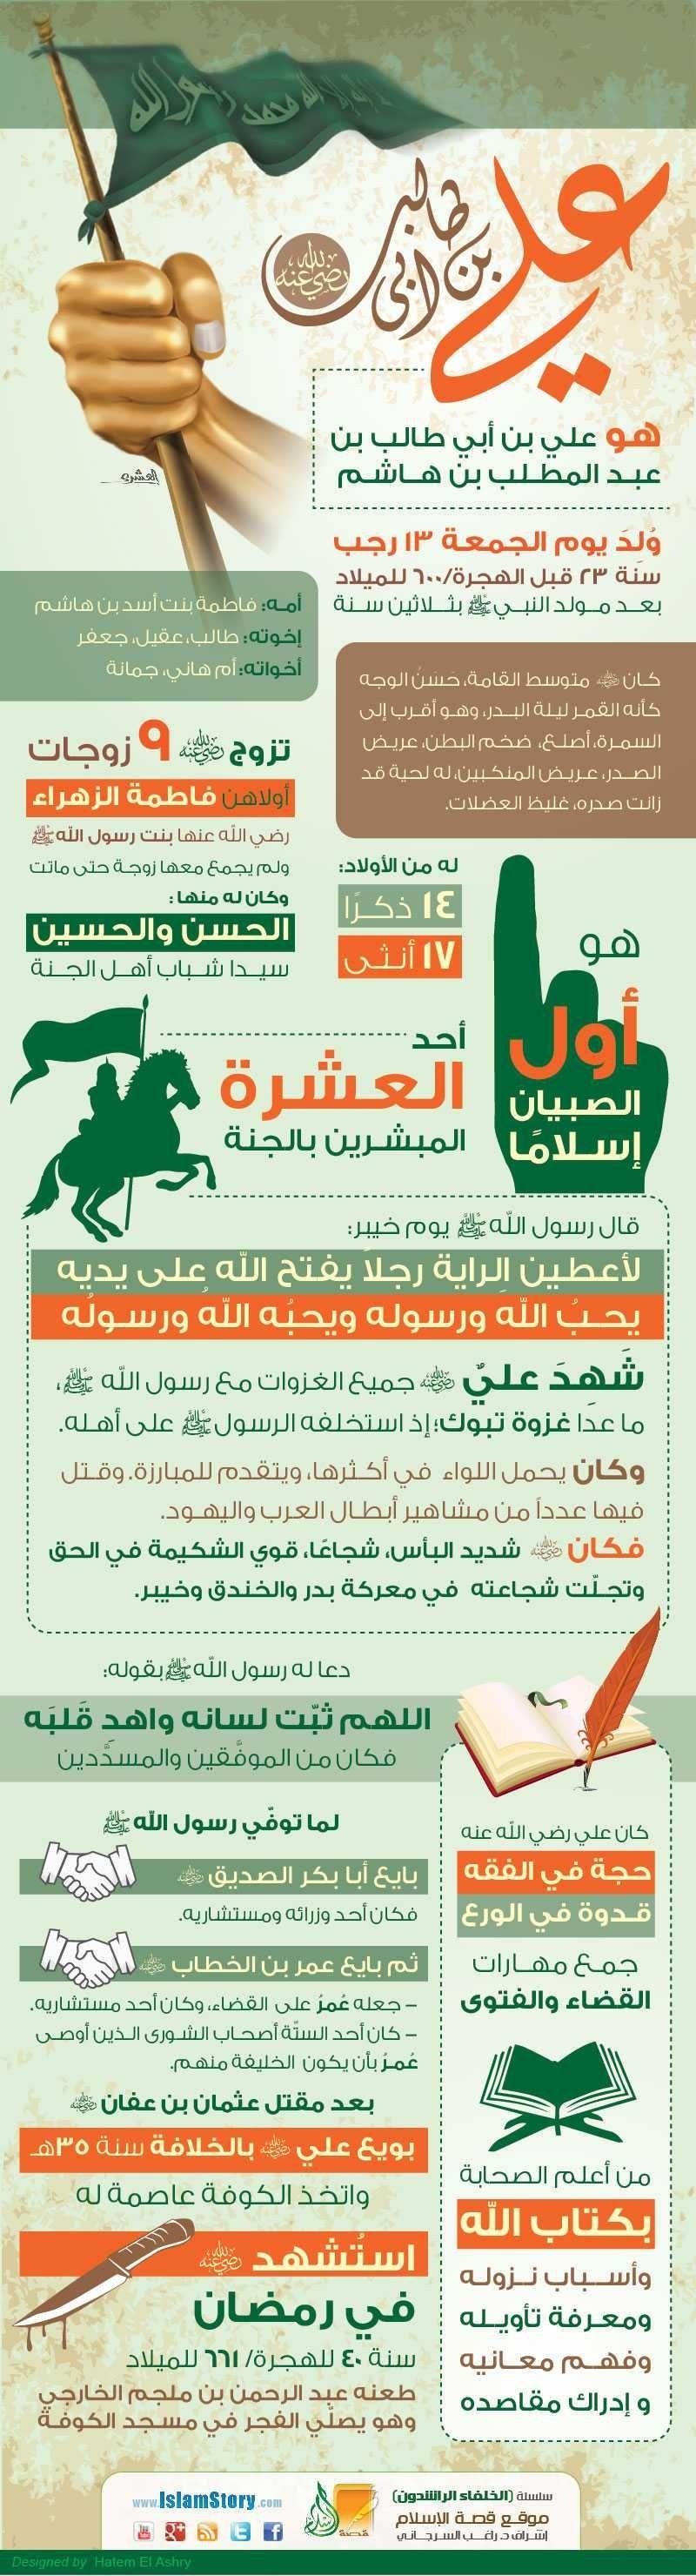 Pin By Abdulrahman Alghamdi On أسماء وأنساب Islam Facts Islam Beliefs Islamic Teachings